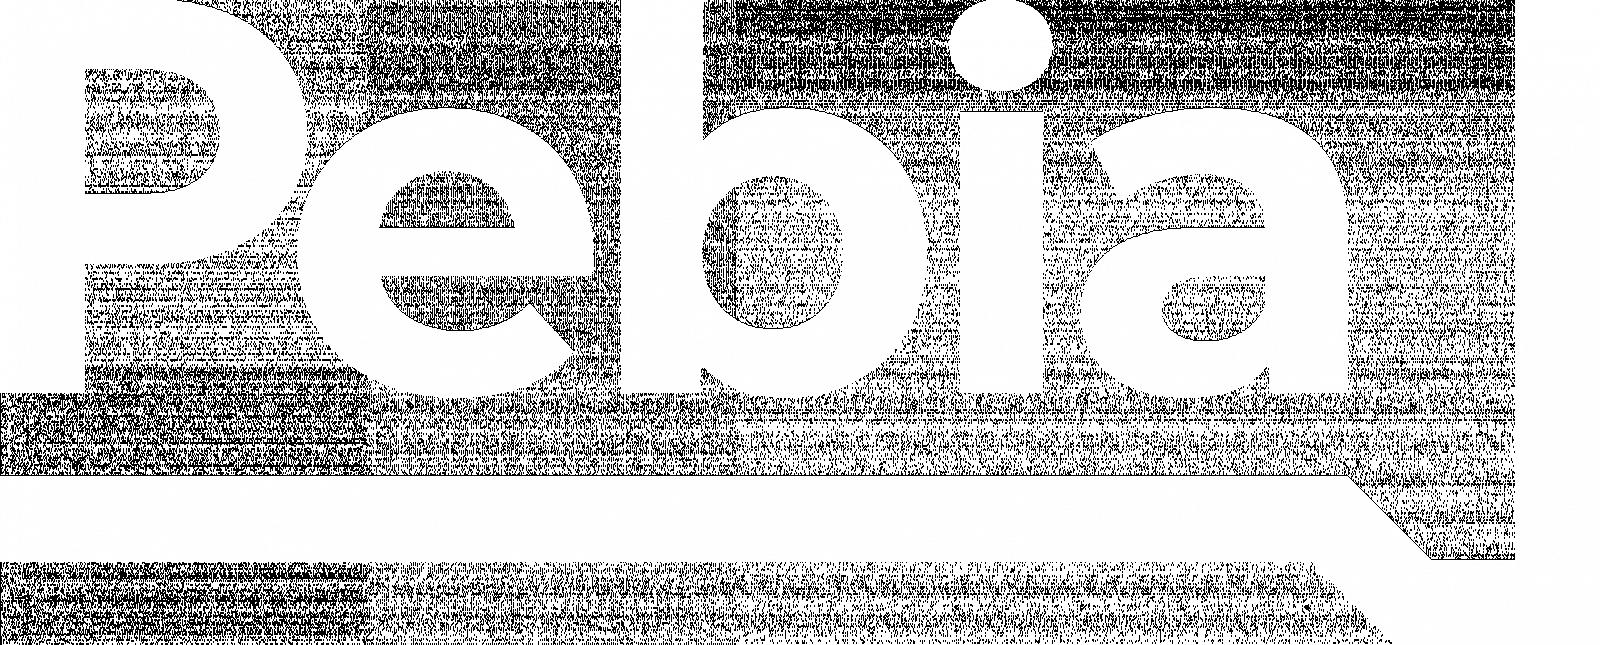 logo pebia_duze_white.png [30.71 KB]